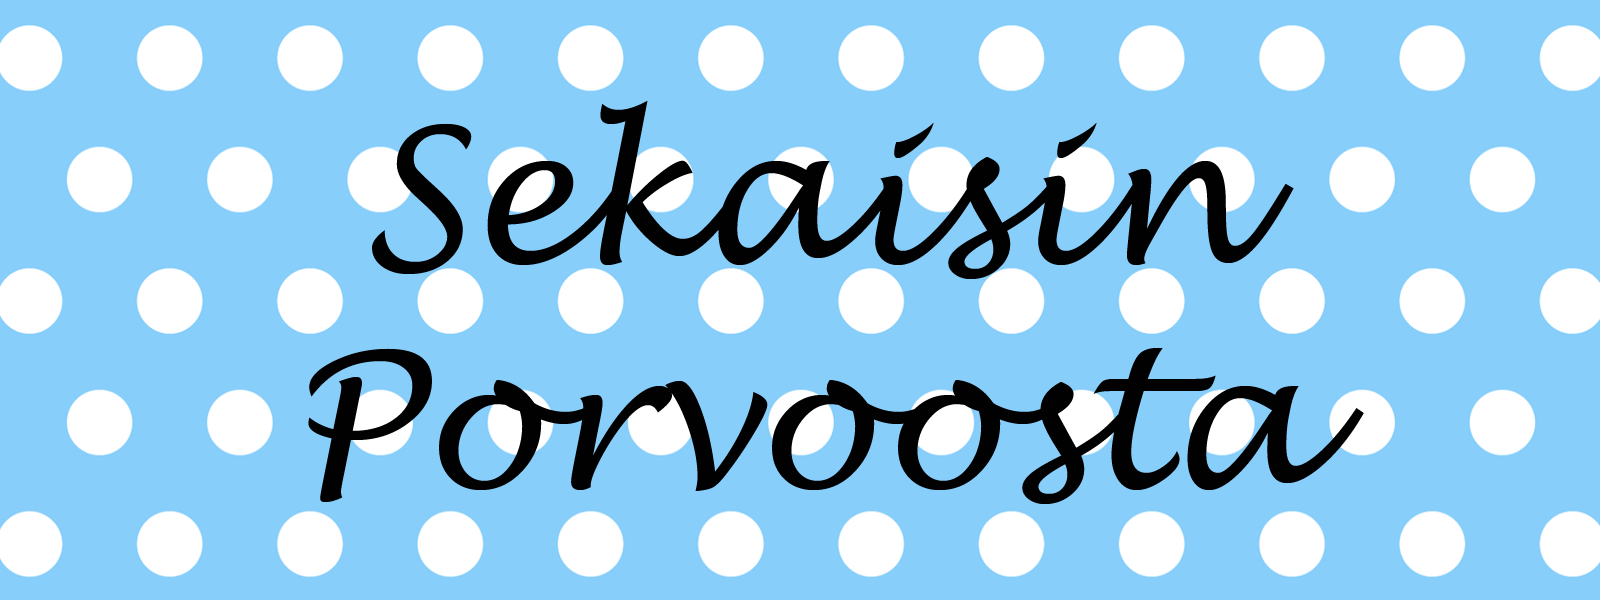 Sekaisin Porvoosta logo